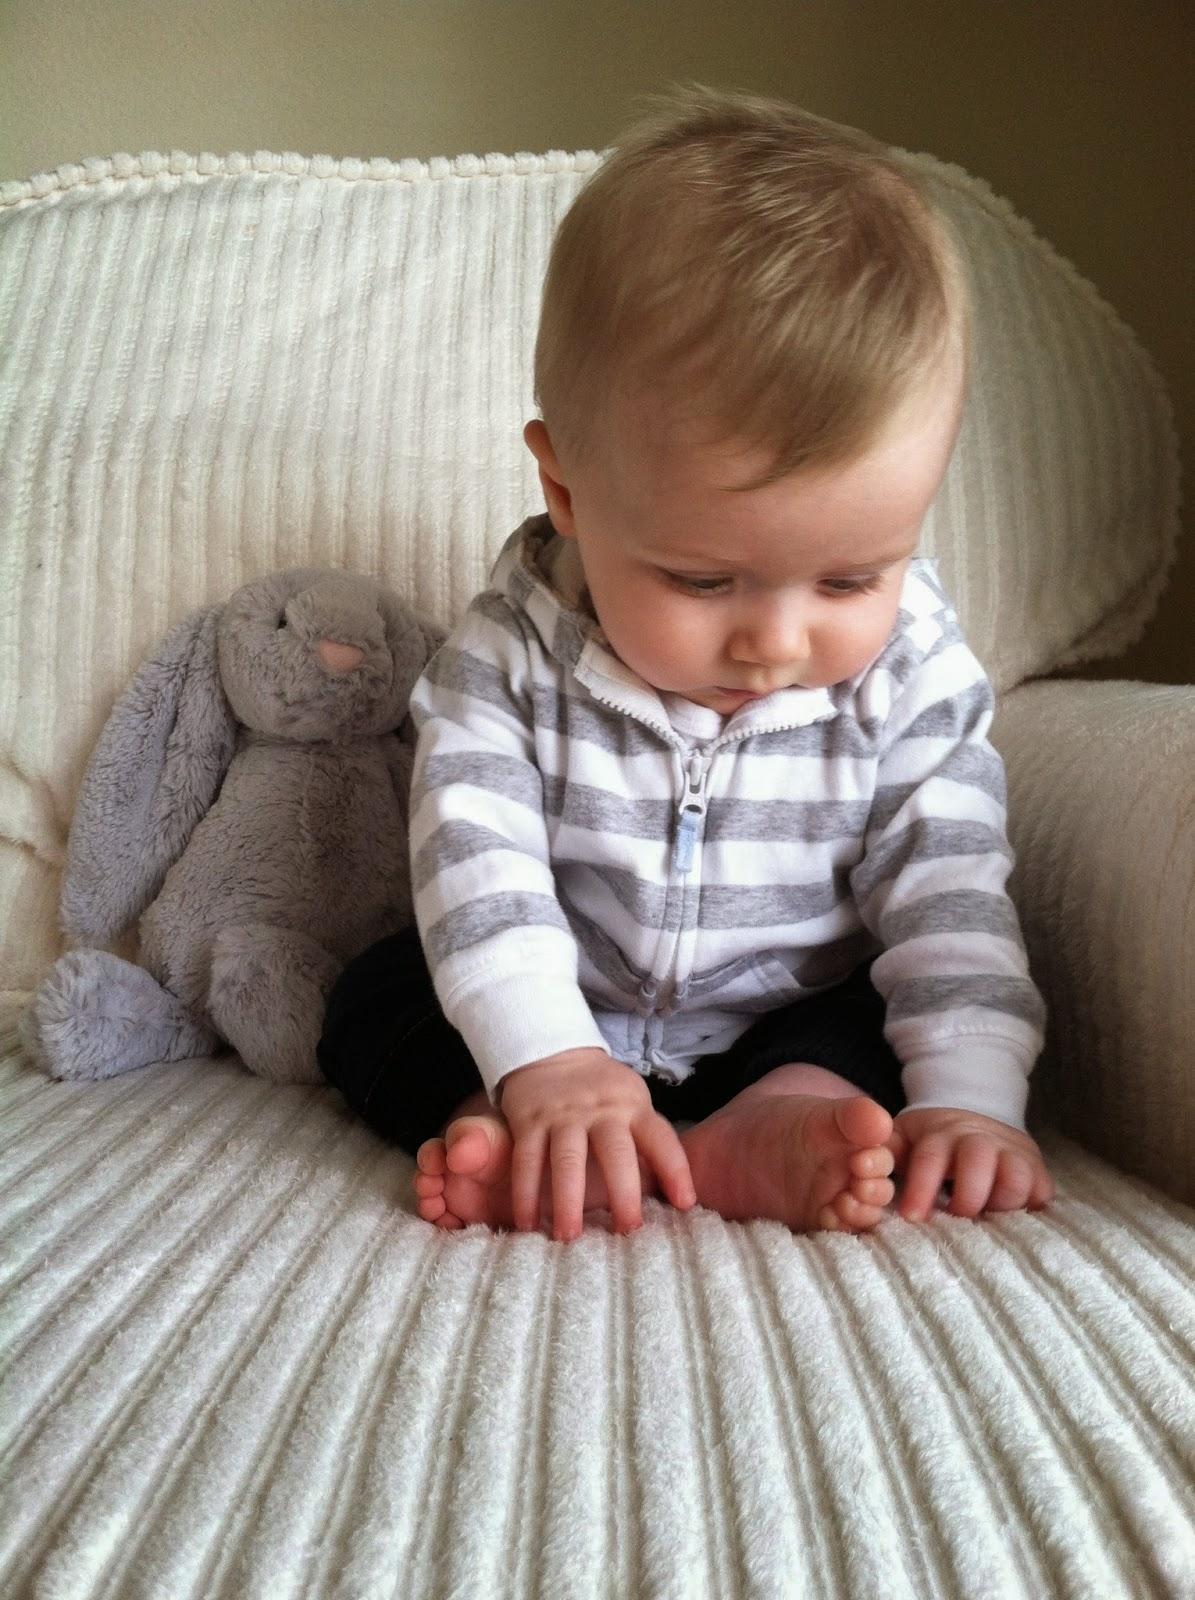 de95e9e42f1e TESSA RAYANNE  Our Baby Is 6 Months Old!  Happy Half Birthday Little ...